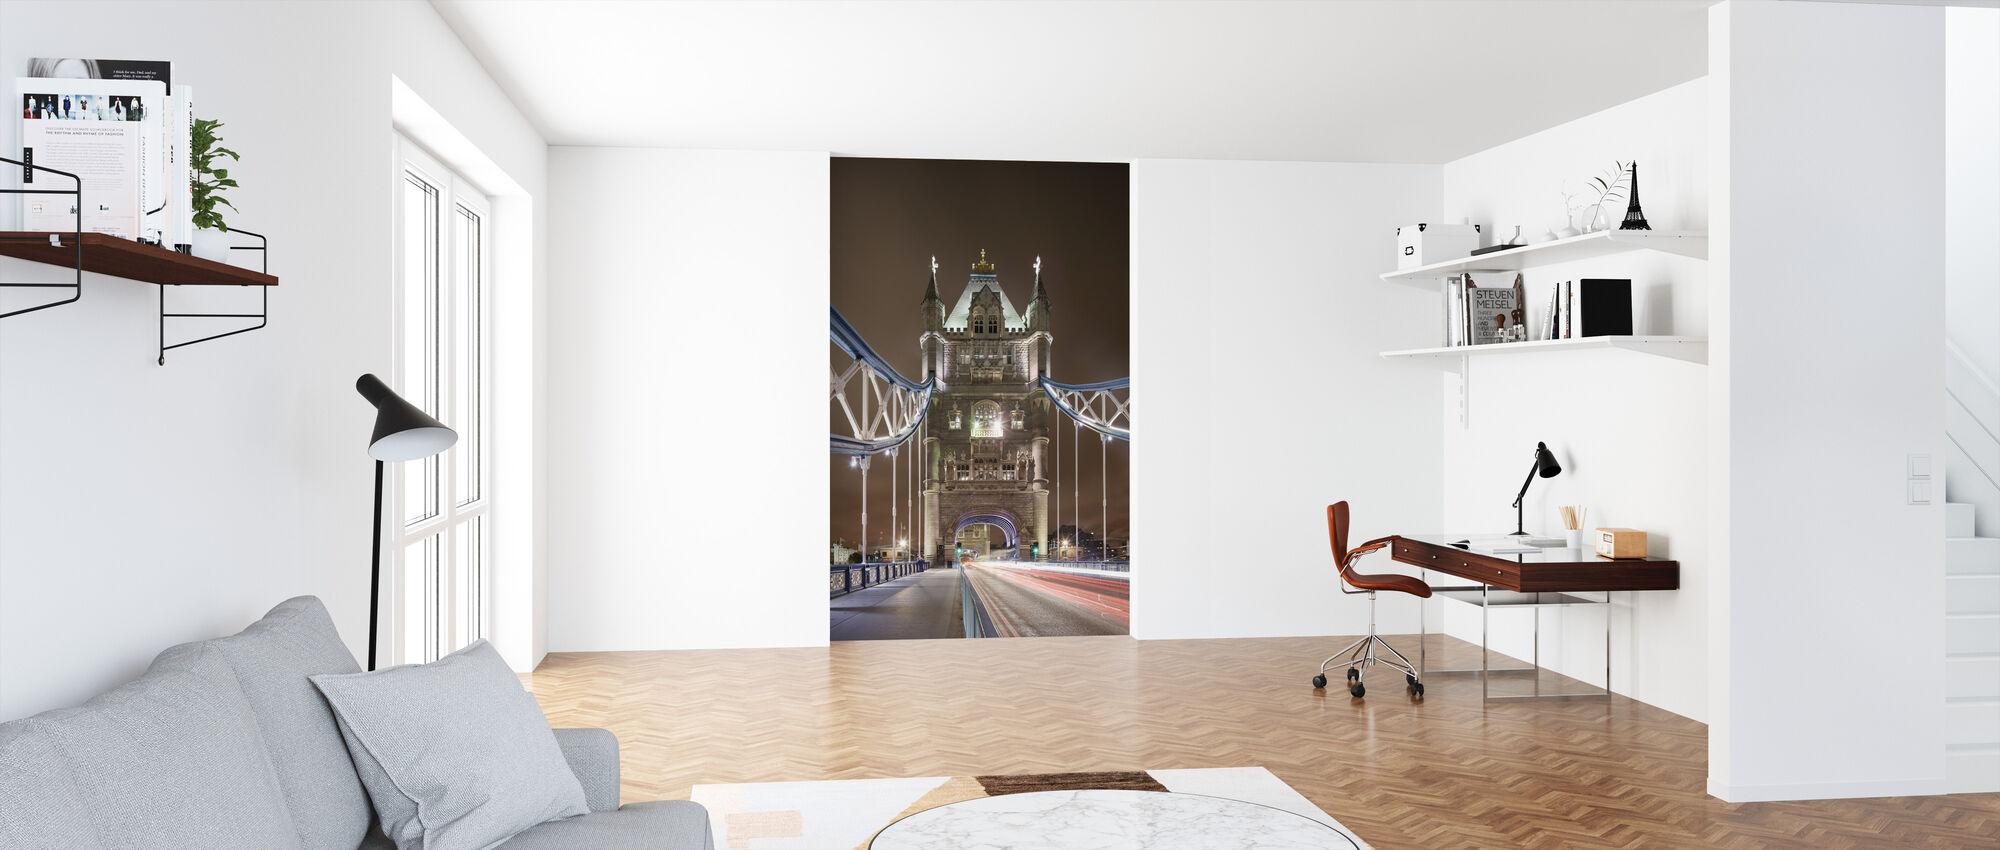 Standing on London Bridge II - Wallpaper - Office